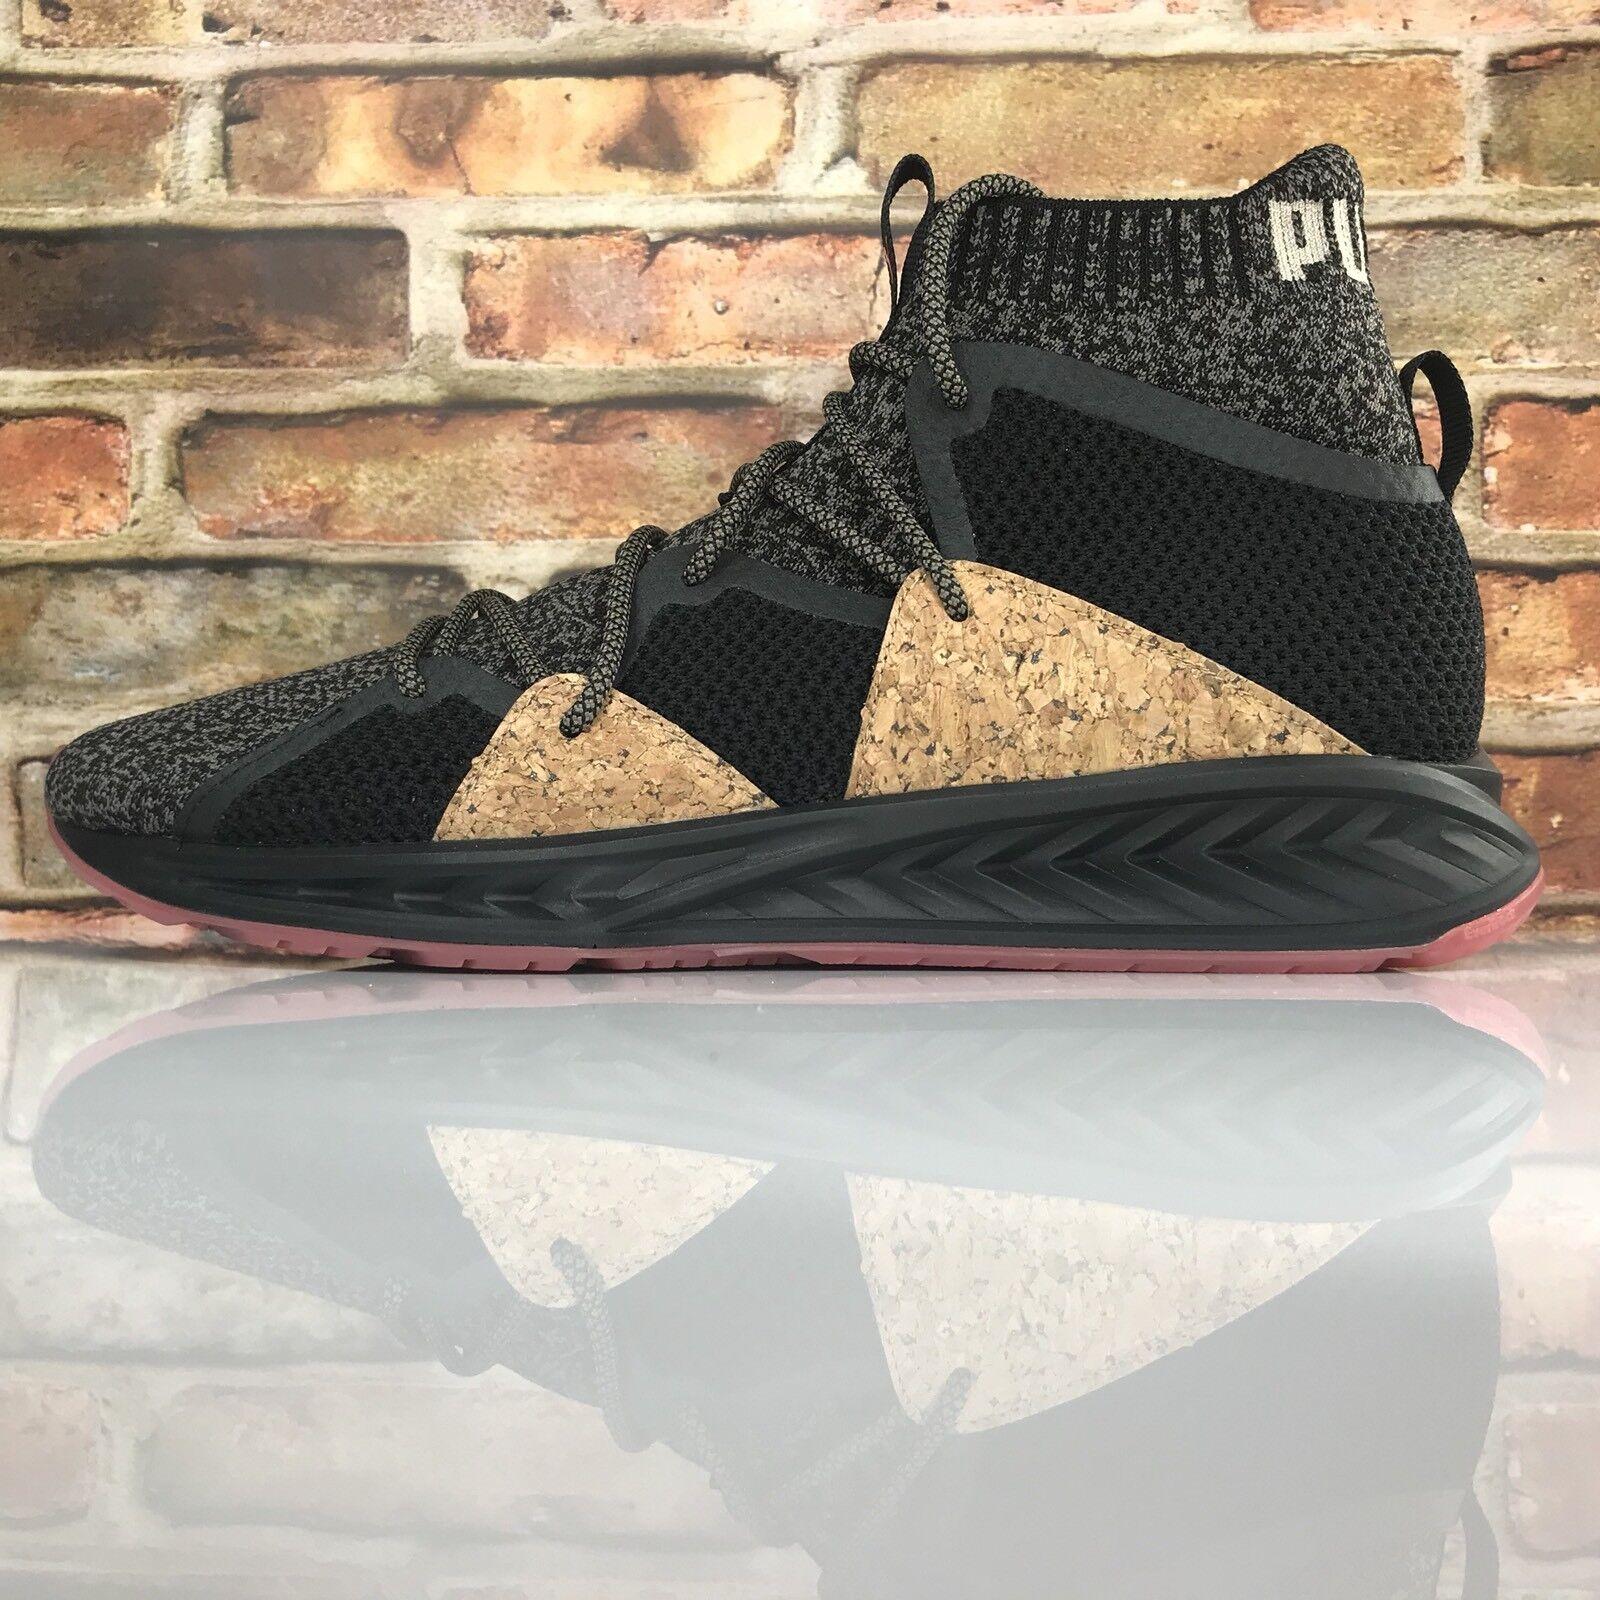 PUMA Limited Edition Ignite Evoknit Black Cork Mens 11.5 Training Running shoes